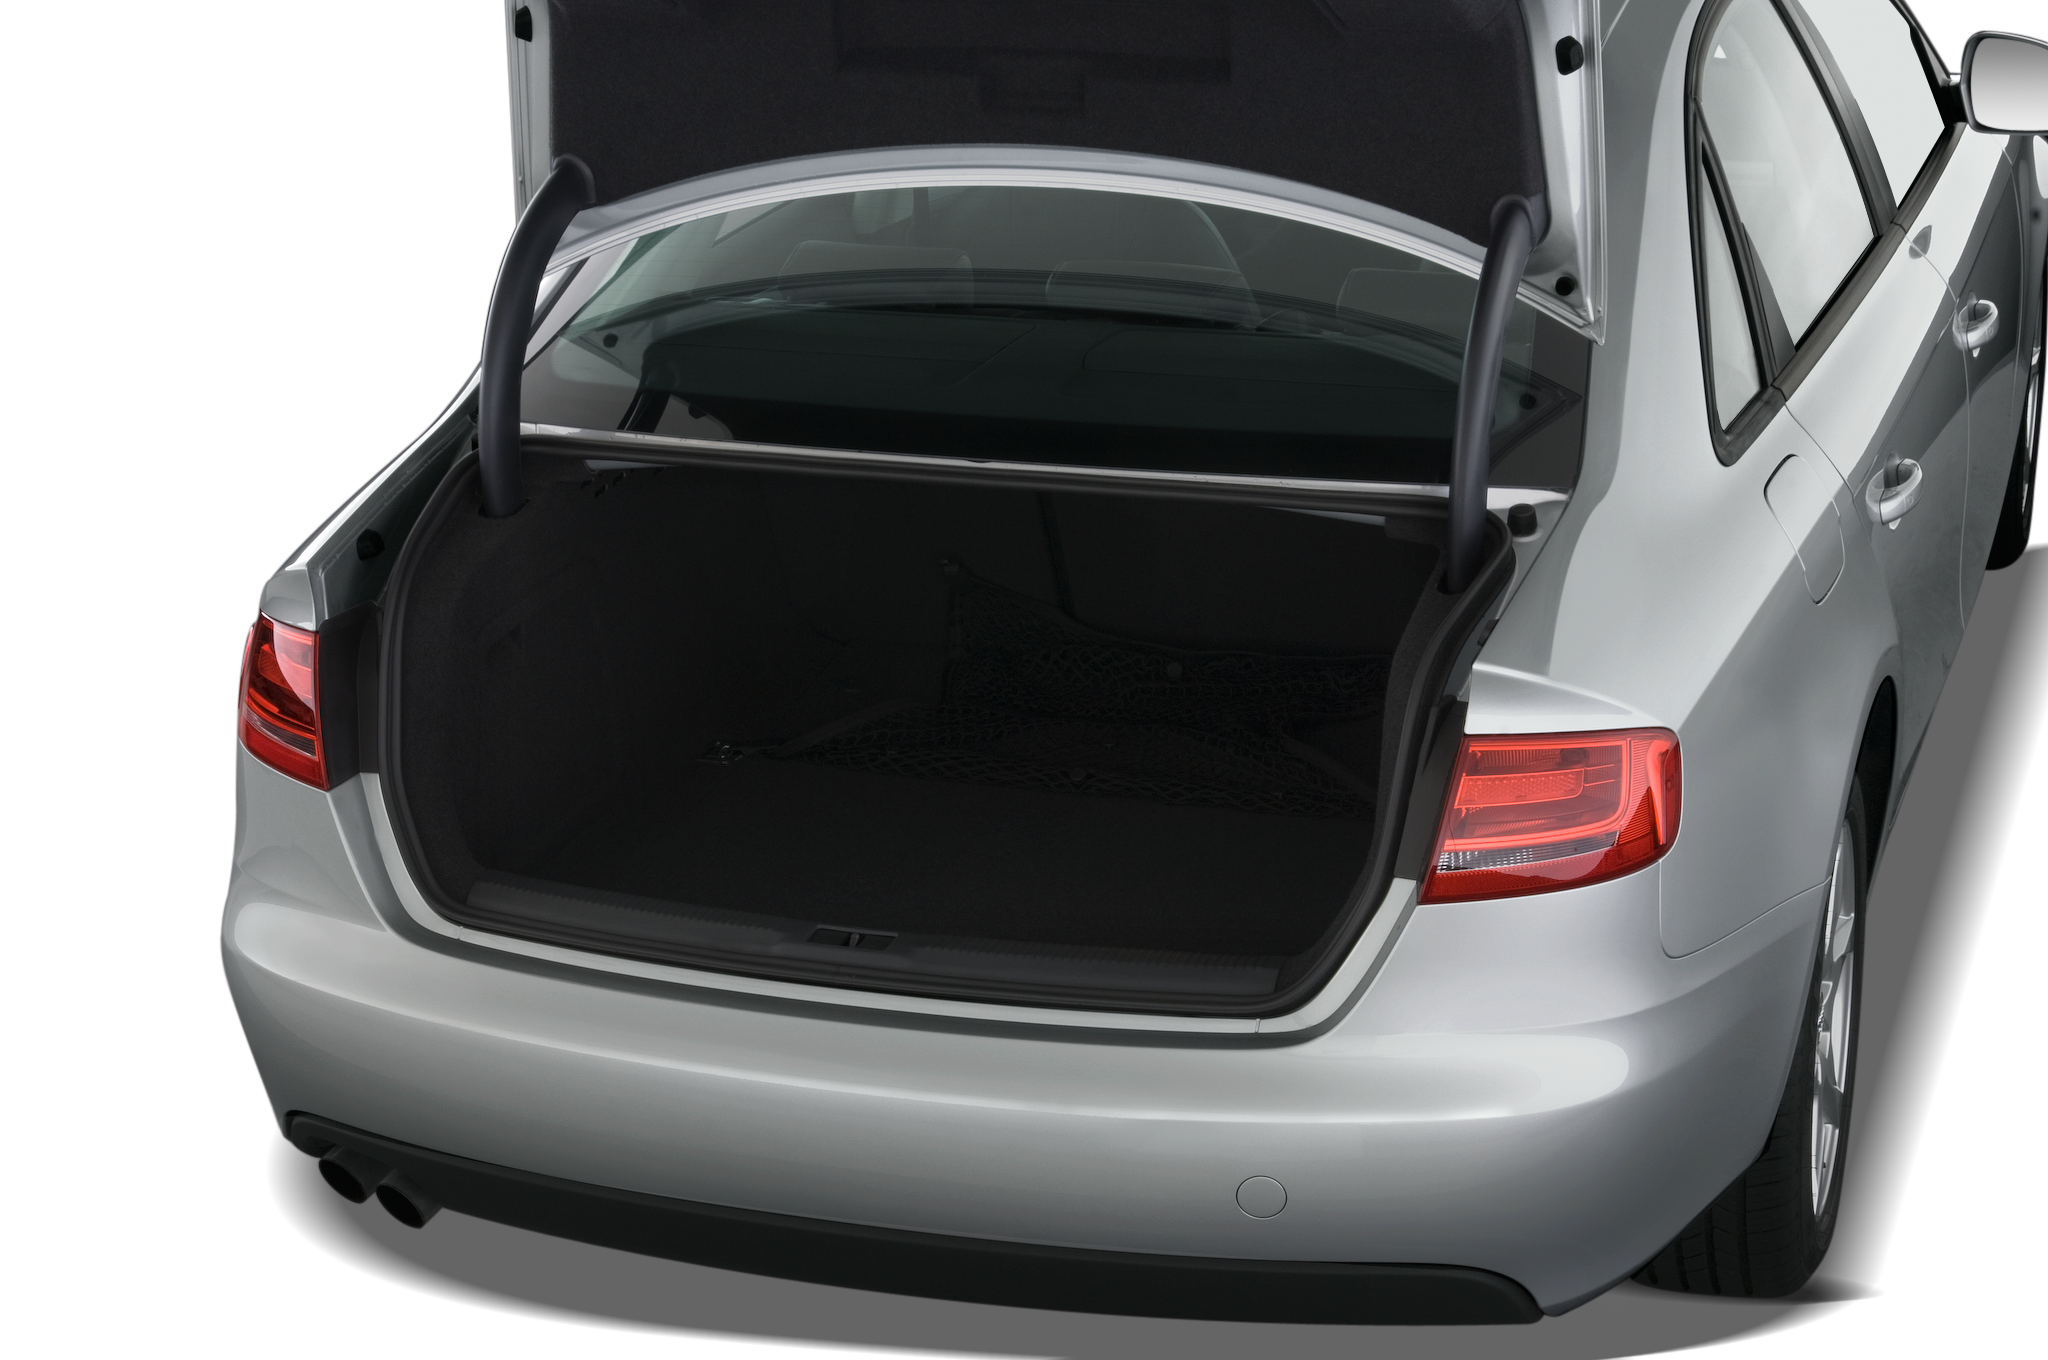 2009 Audi A4 Interior Dimensions Cabinets Matttroy